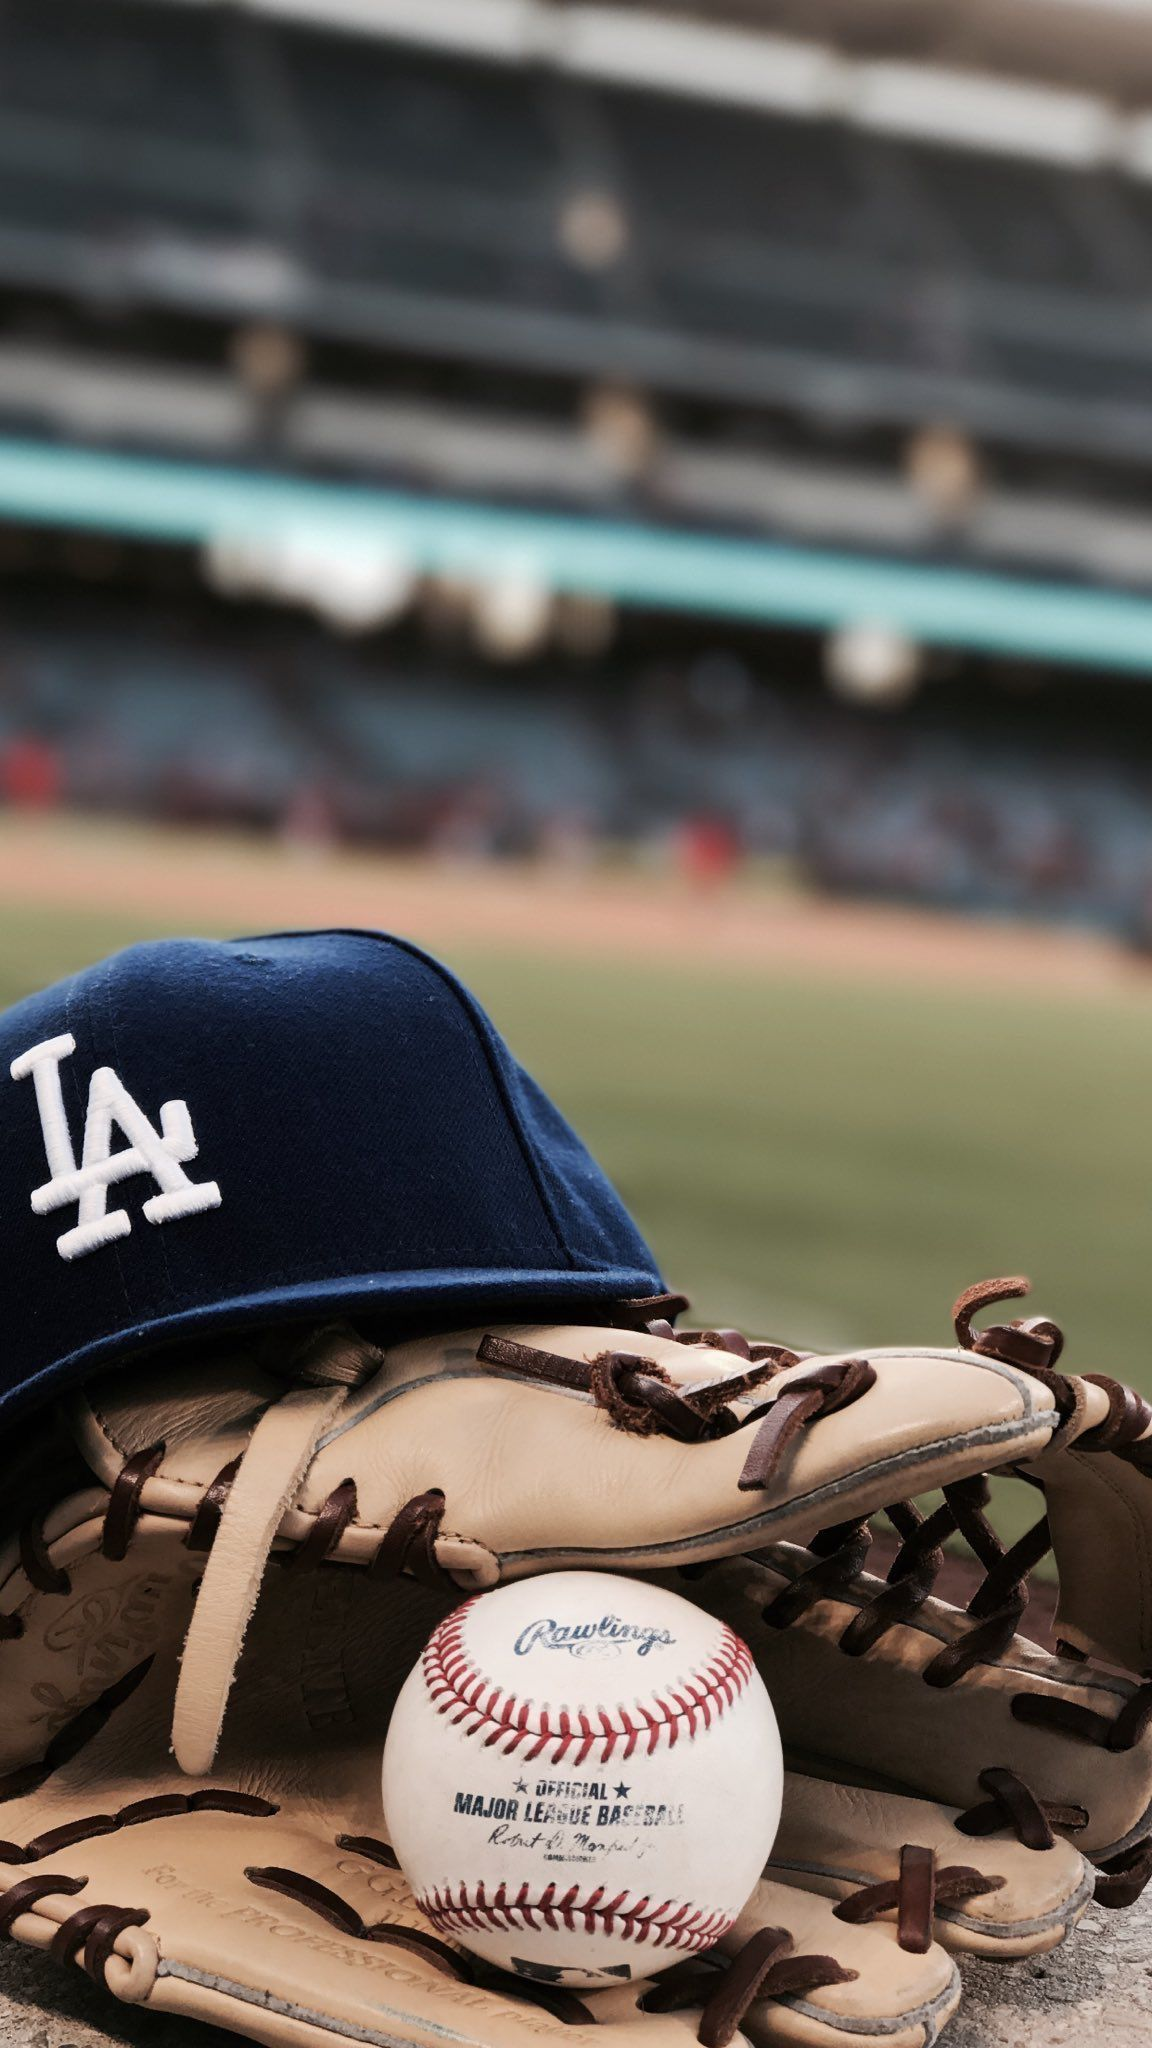 Pin by Linda Maniccia on ️⚾️ Dodgers Baseball wallpaper